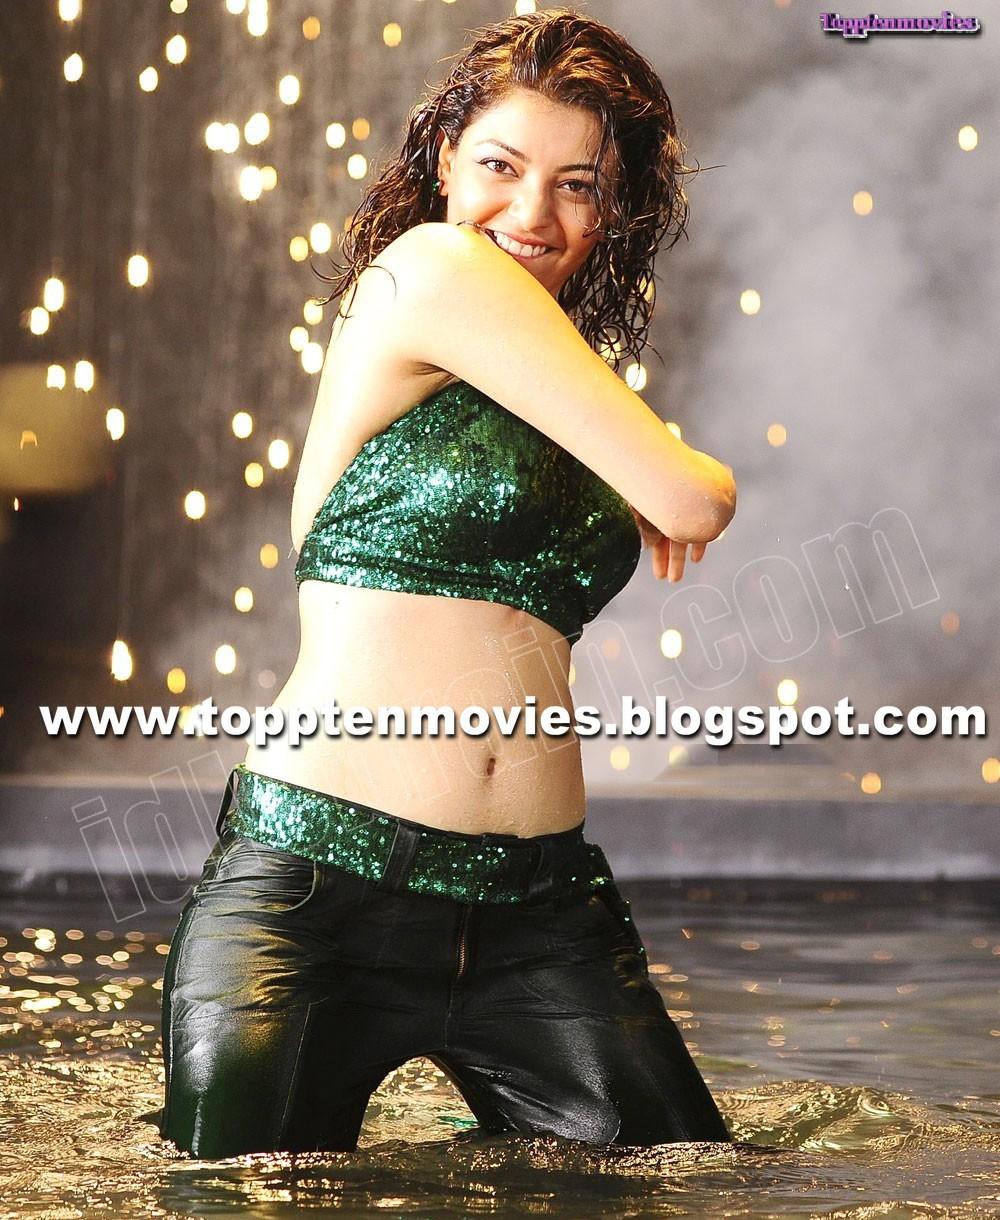 http://1.bp.blogspot.com/_iRqKBCtH6ZM/S_tyXvqV5II/AAAAAAAACHg/84Ws4VSmPr4/s1600/KajalAgarwal-Sexy-Navel-Show+%282%29.jpg